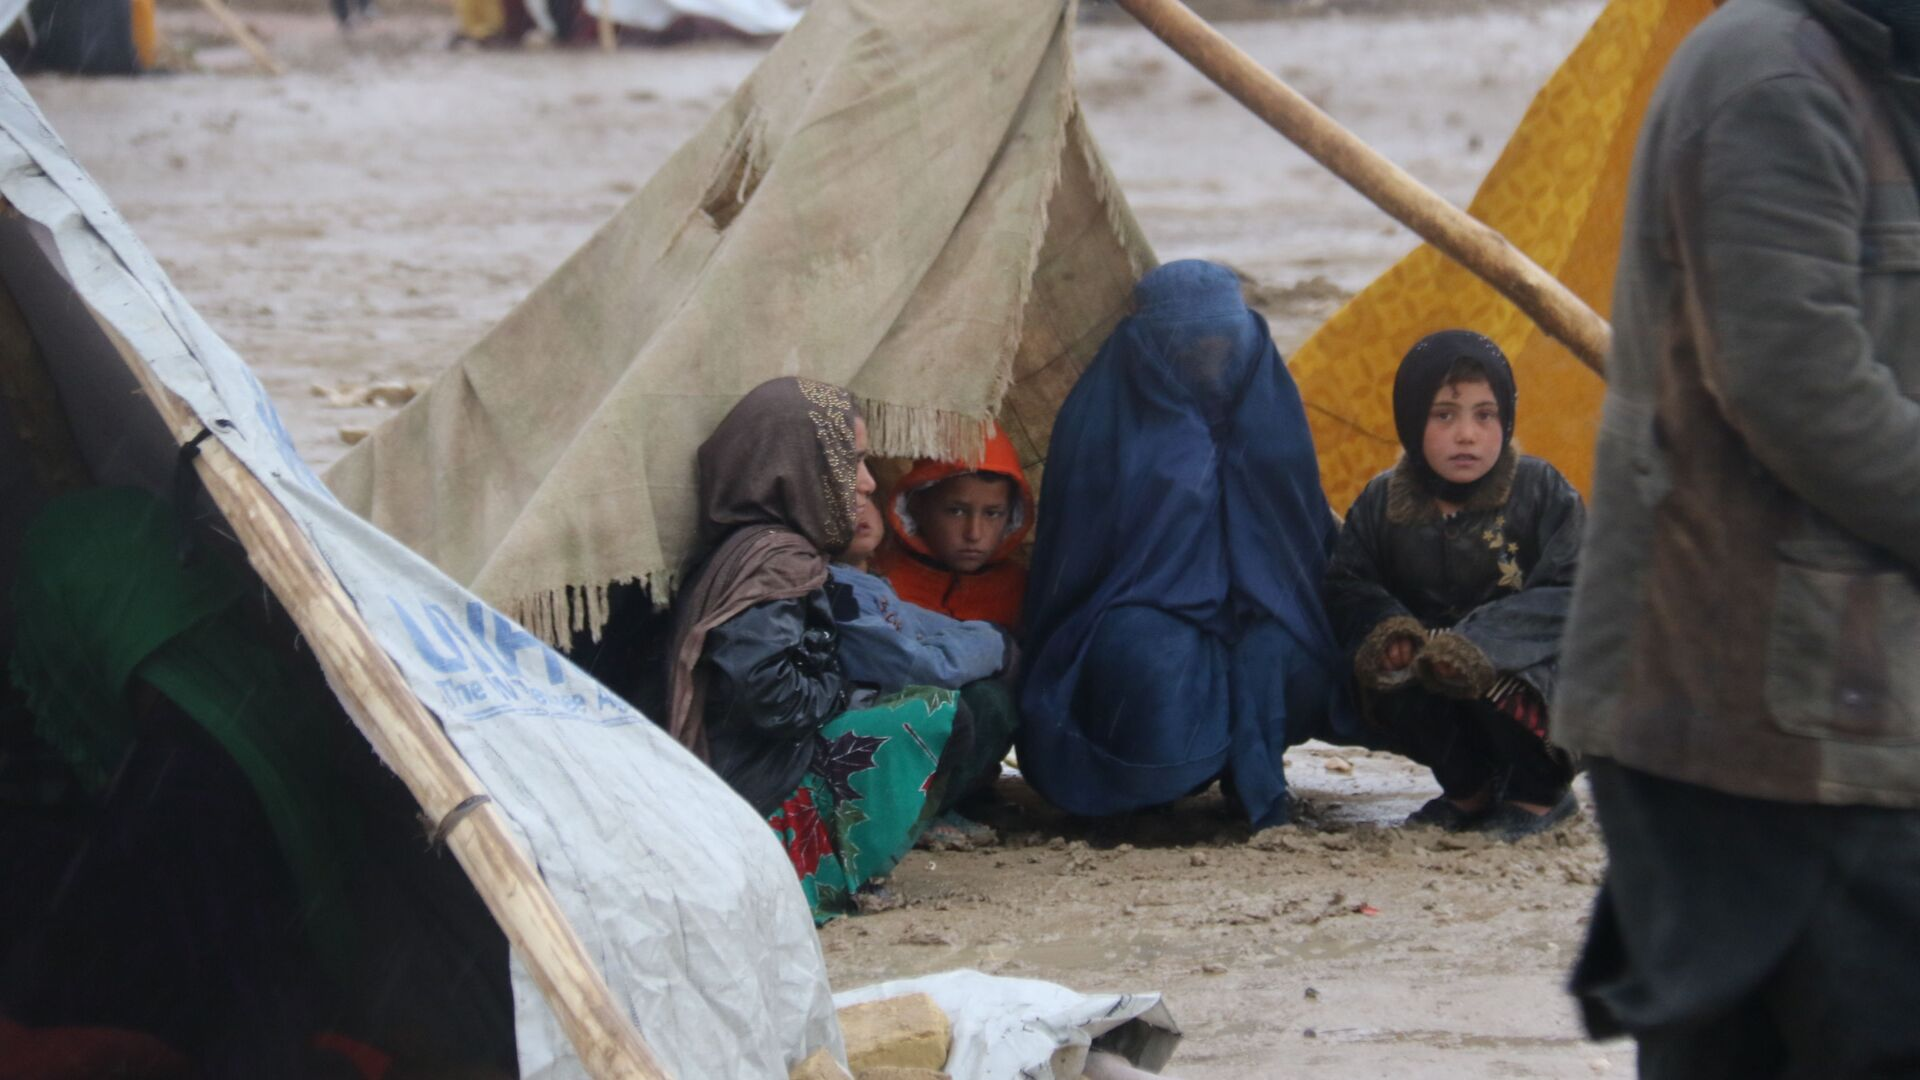 Rifugiati afghani a Mazar-i Sharif - Sputnik Italia, 1920, 04.09.2021